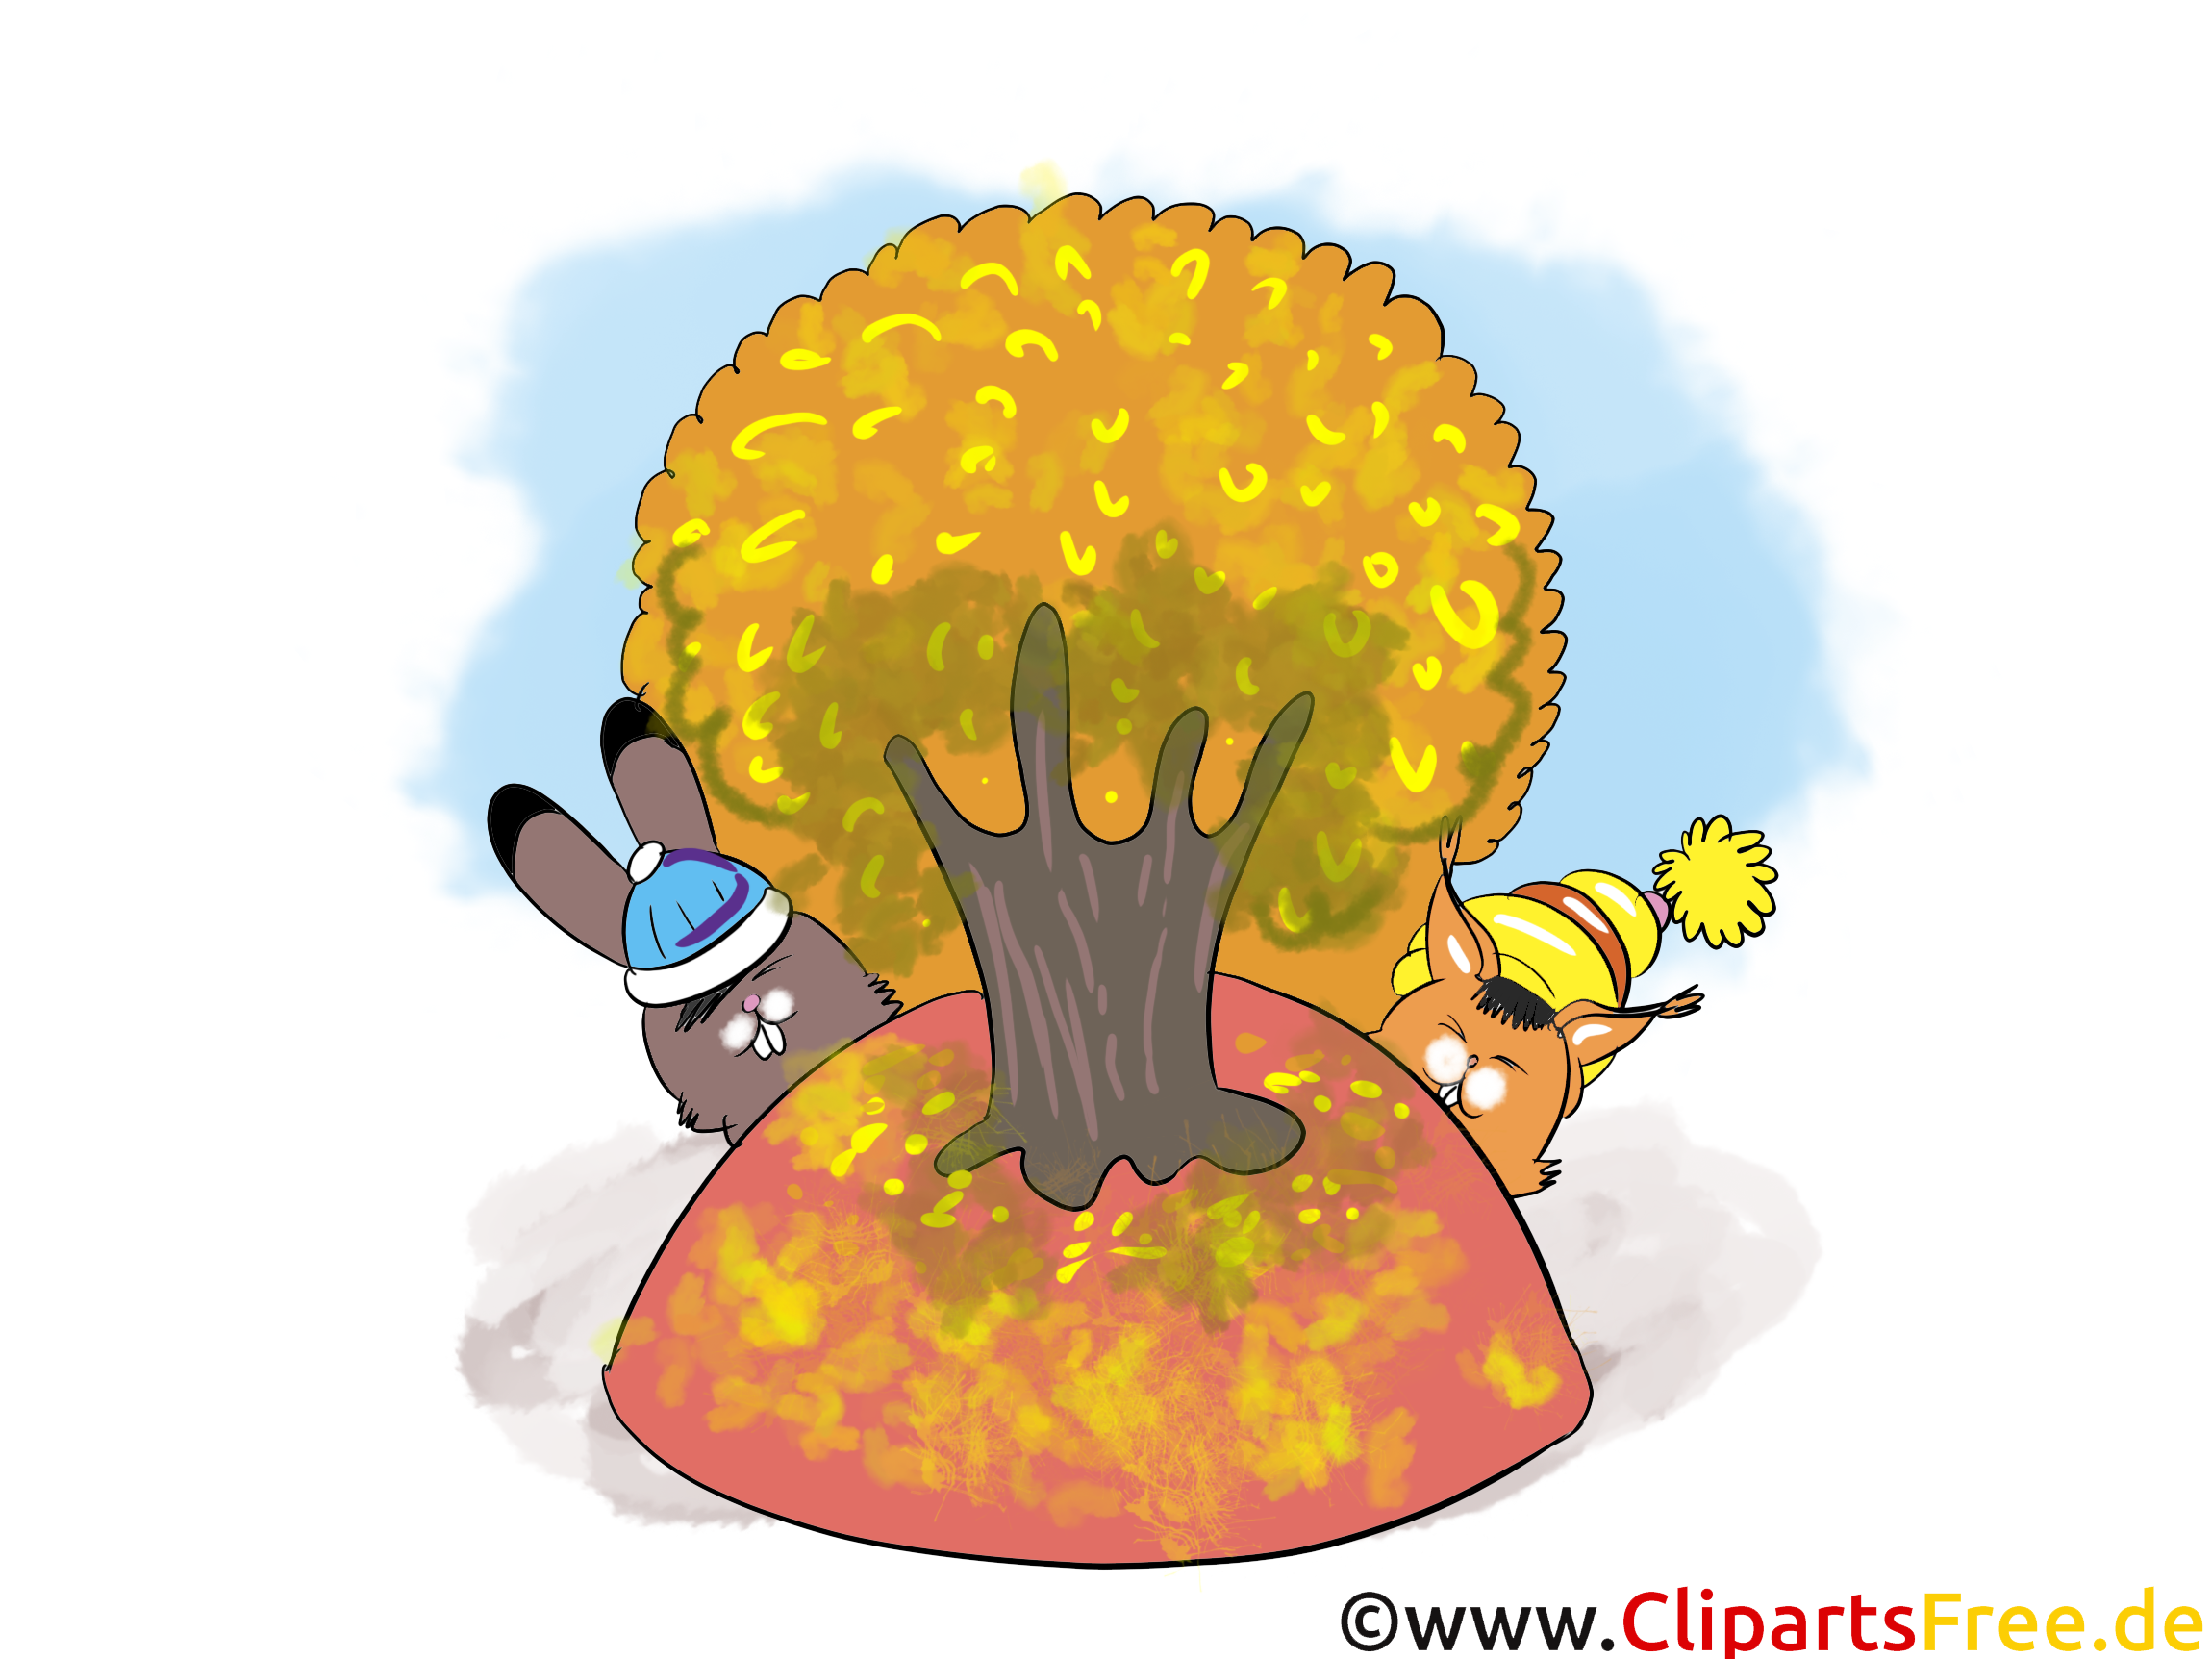 Bilder downloaden Herbst, Baum, Hasen, Blauhimmel